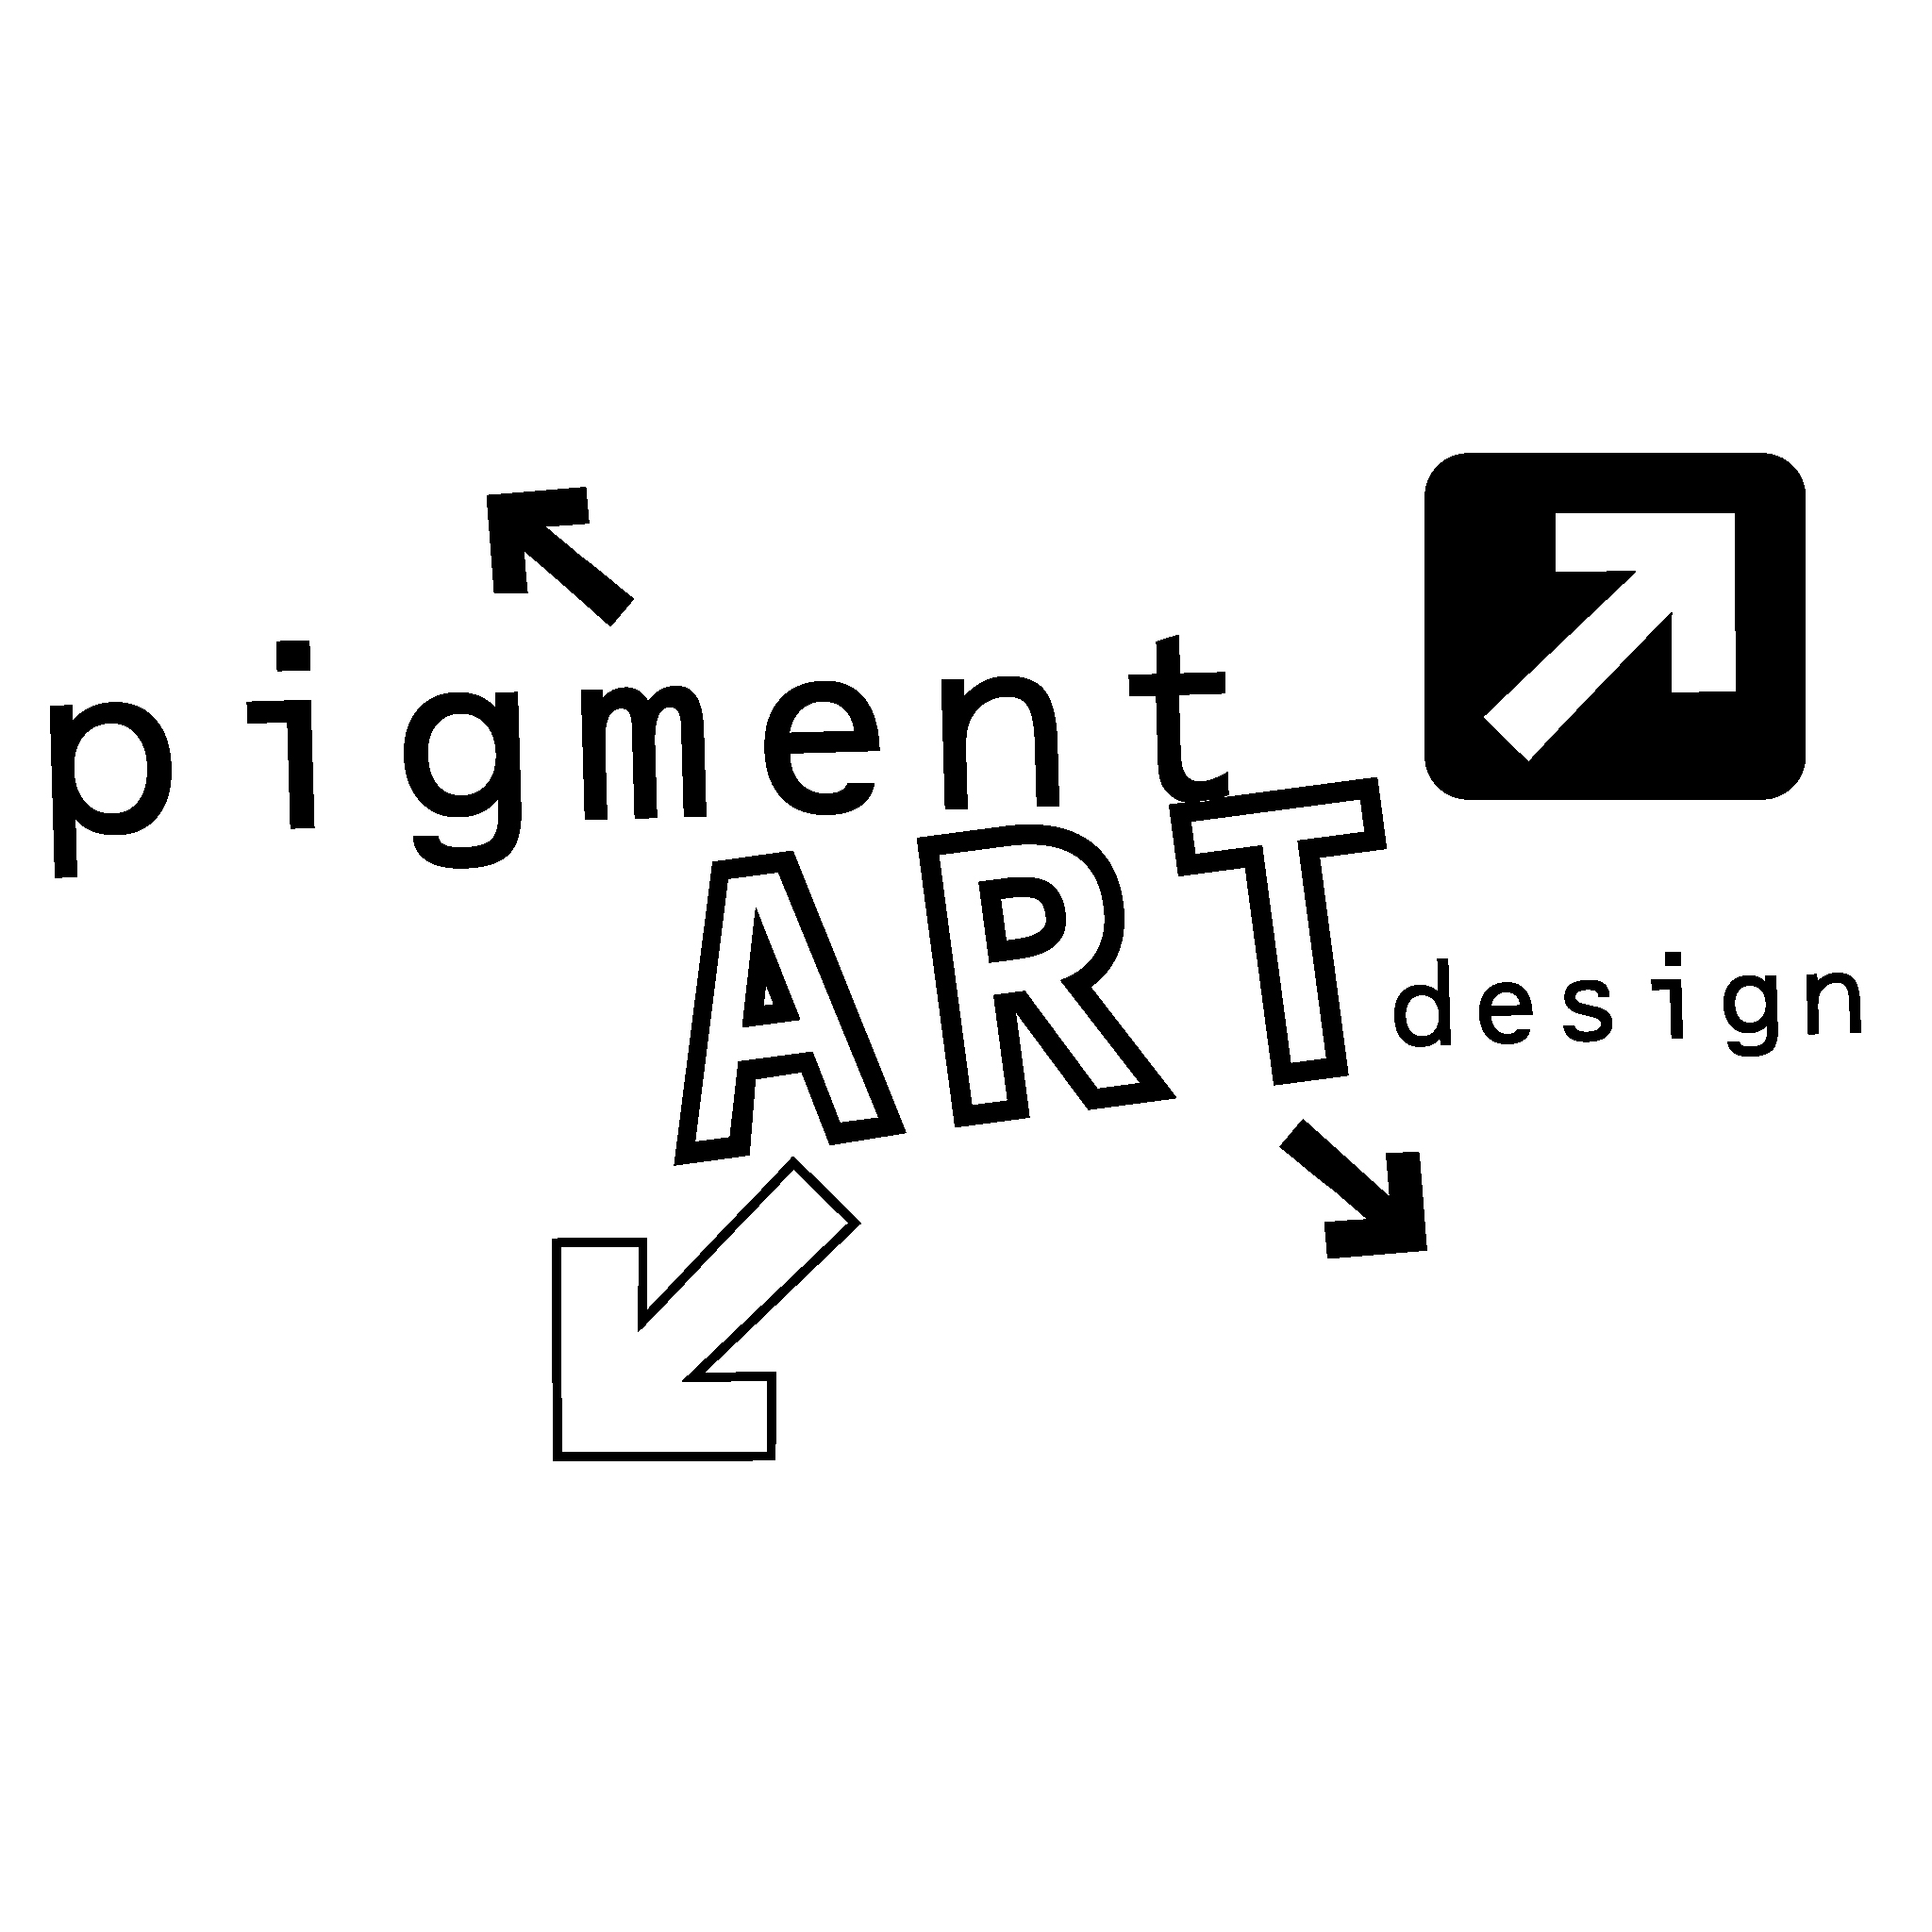 PigmentArt